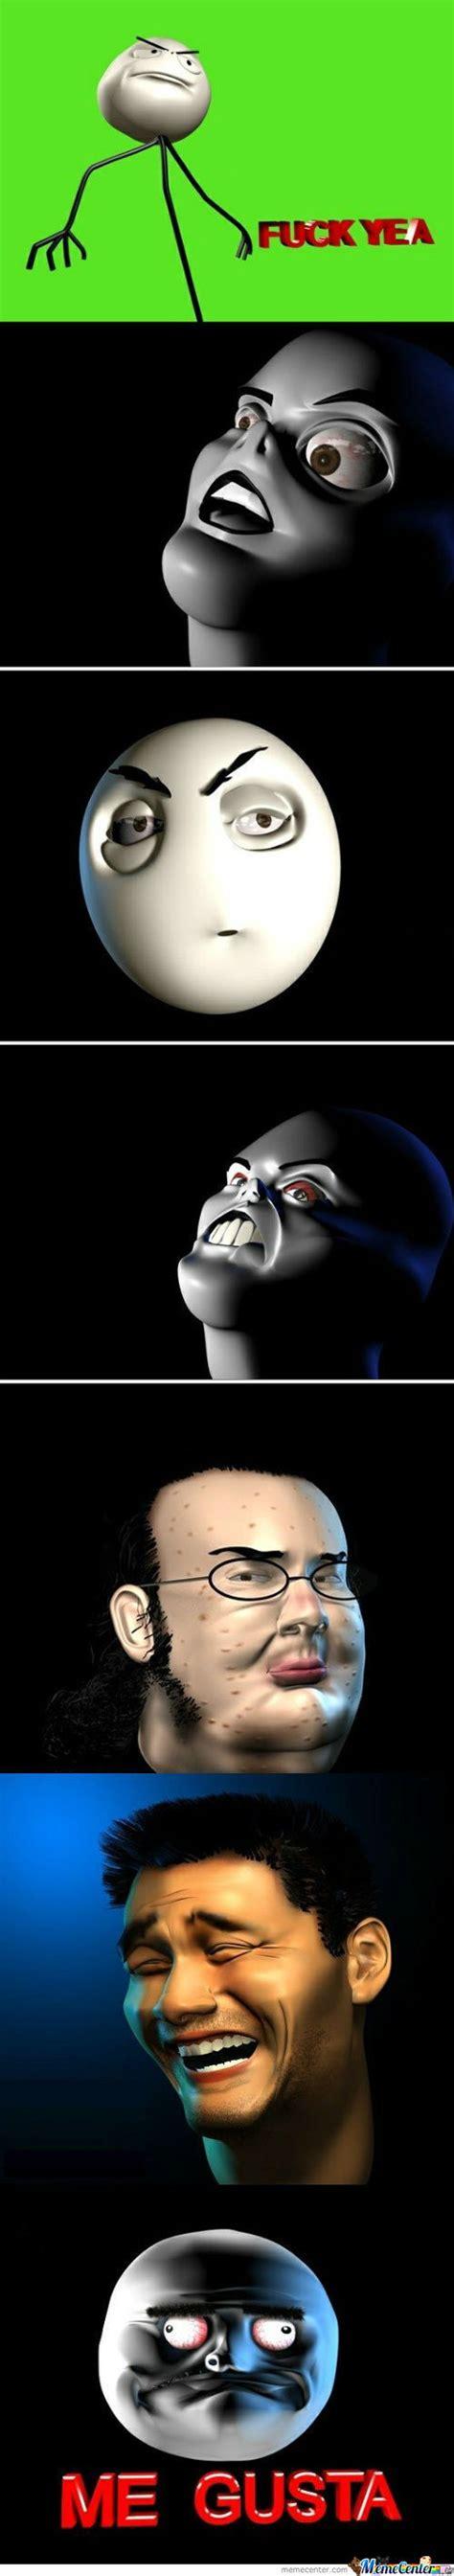 3d Meme - bitch please wow death knight face roll memes best